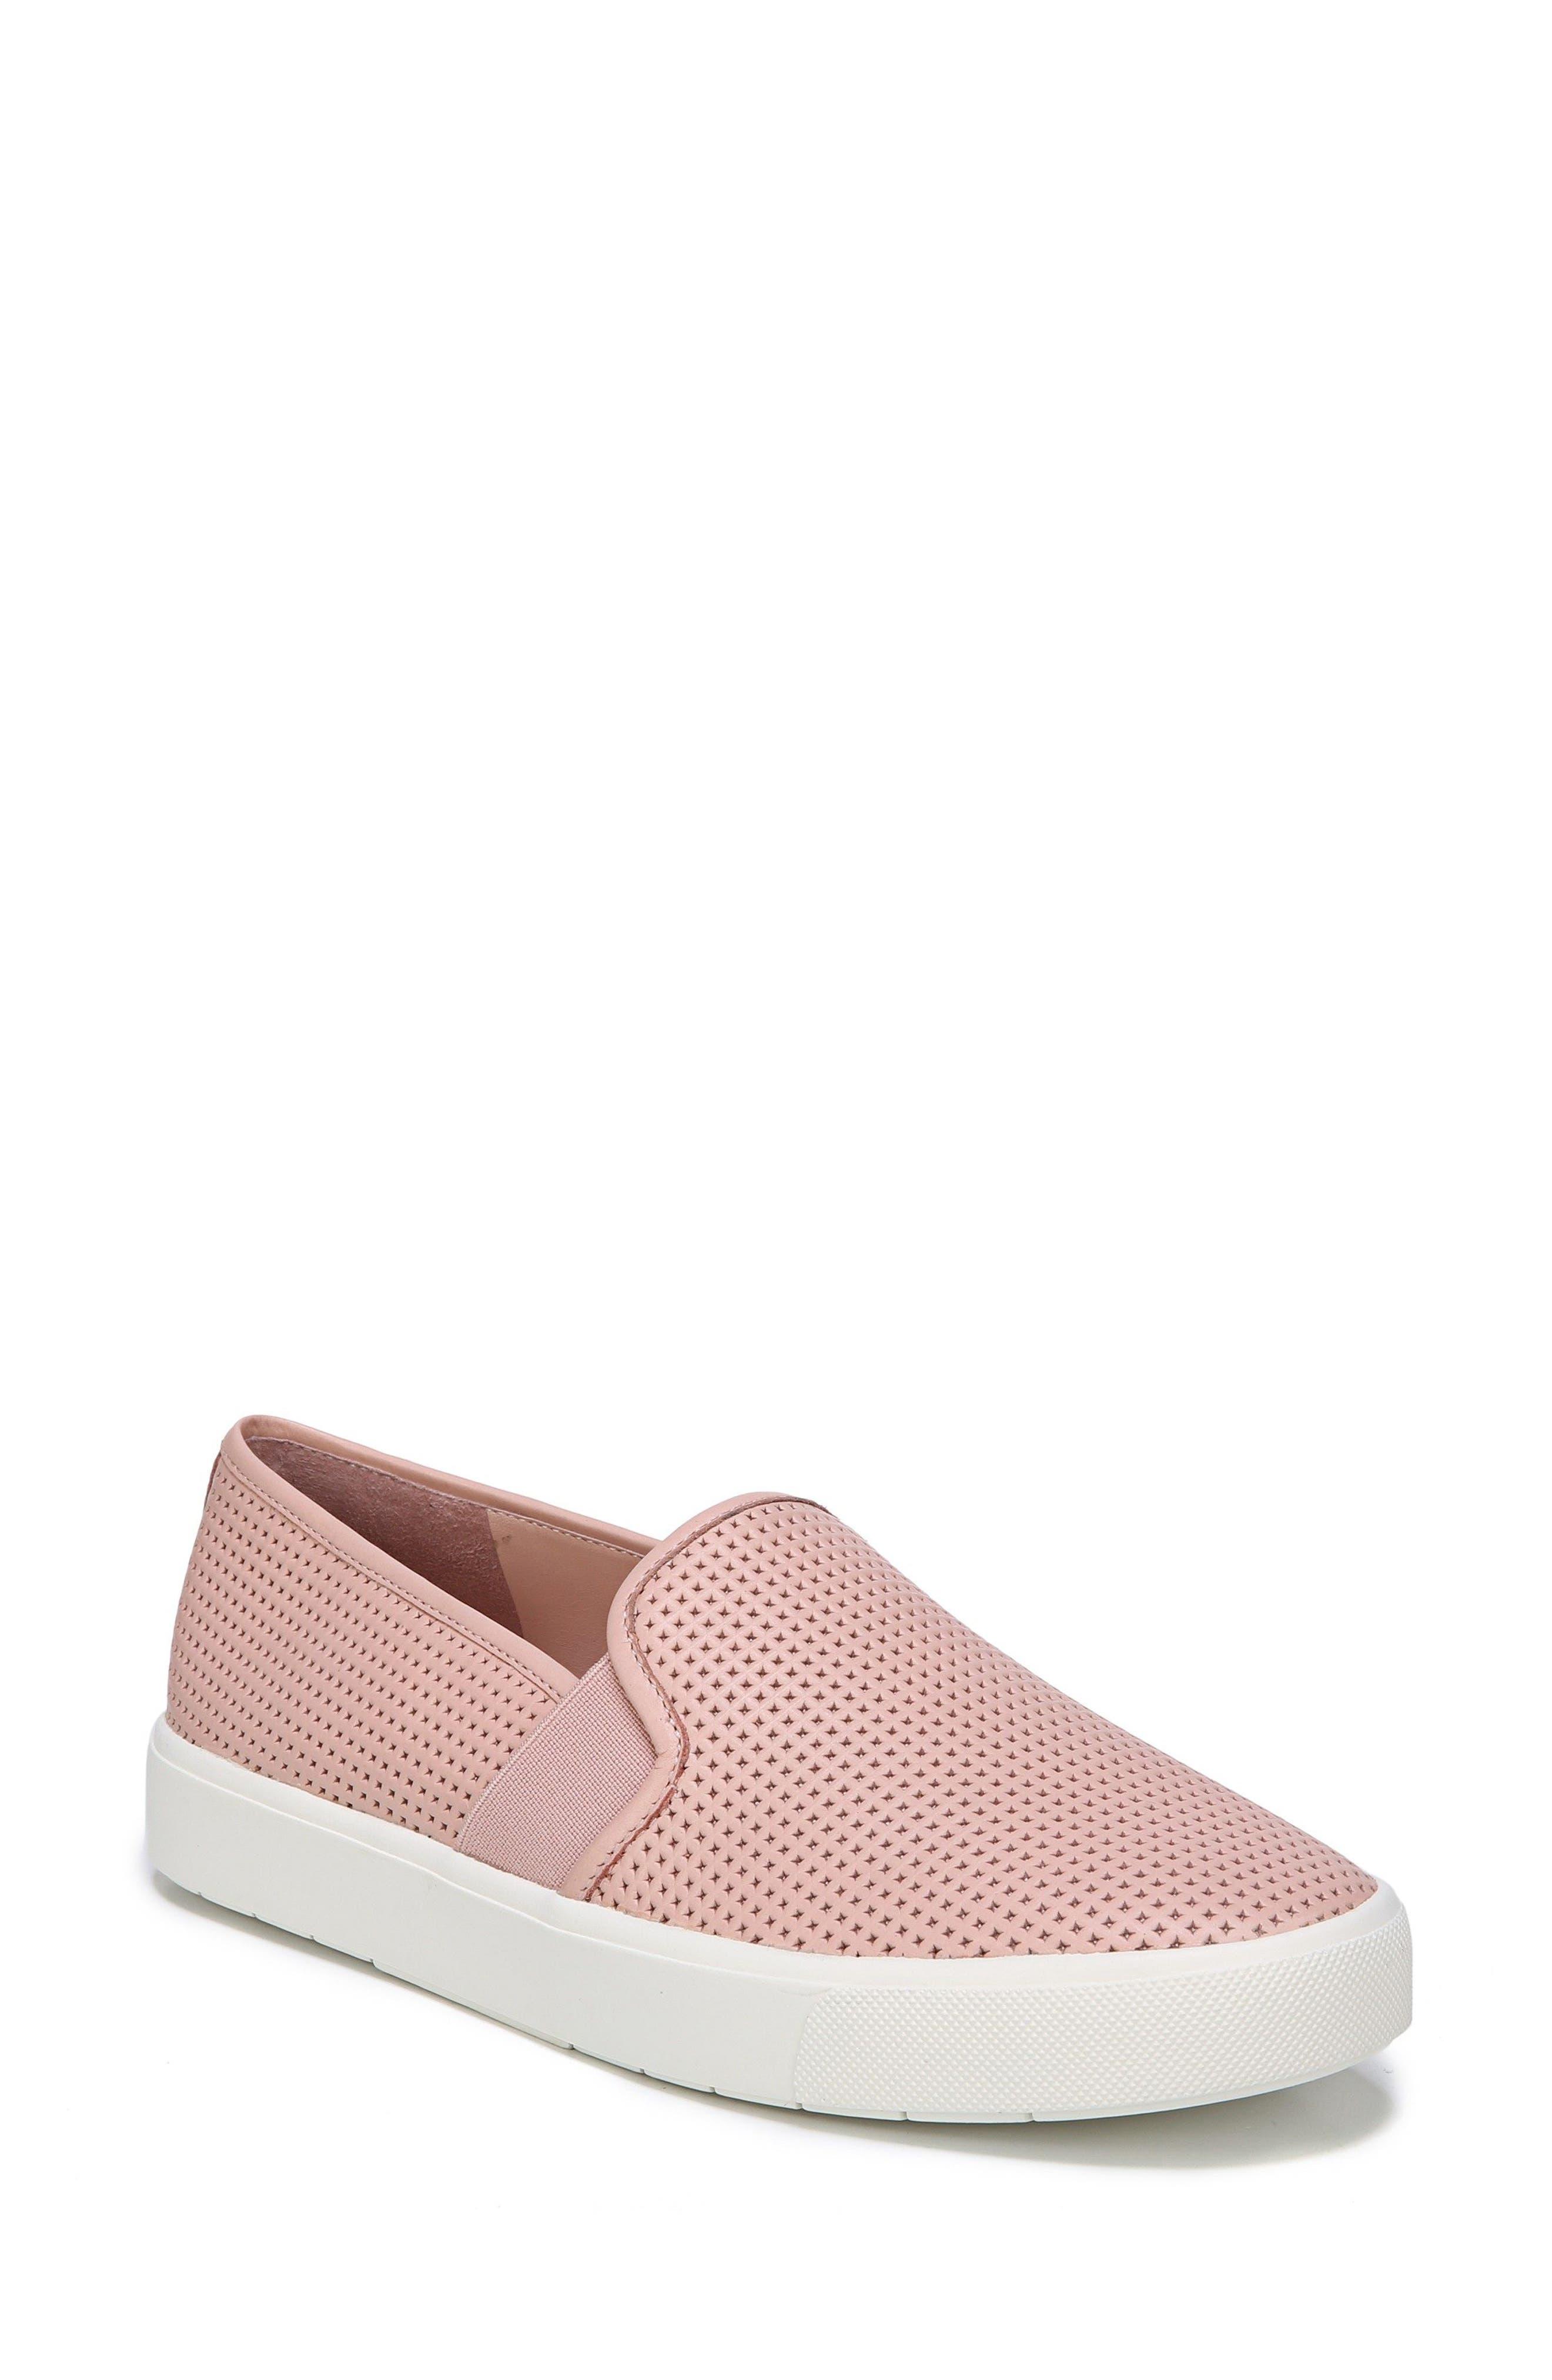 Blair 5 Slip-On Sneaker,                         Main,                         color, ROSE